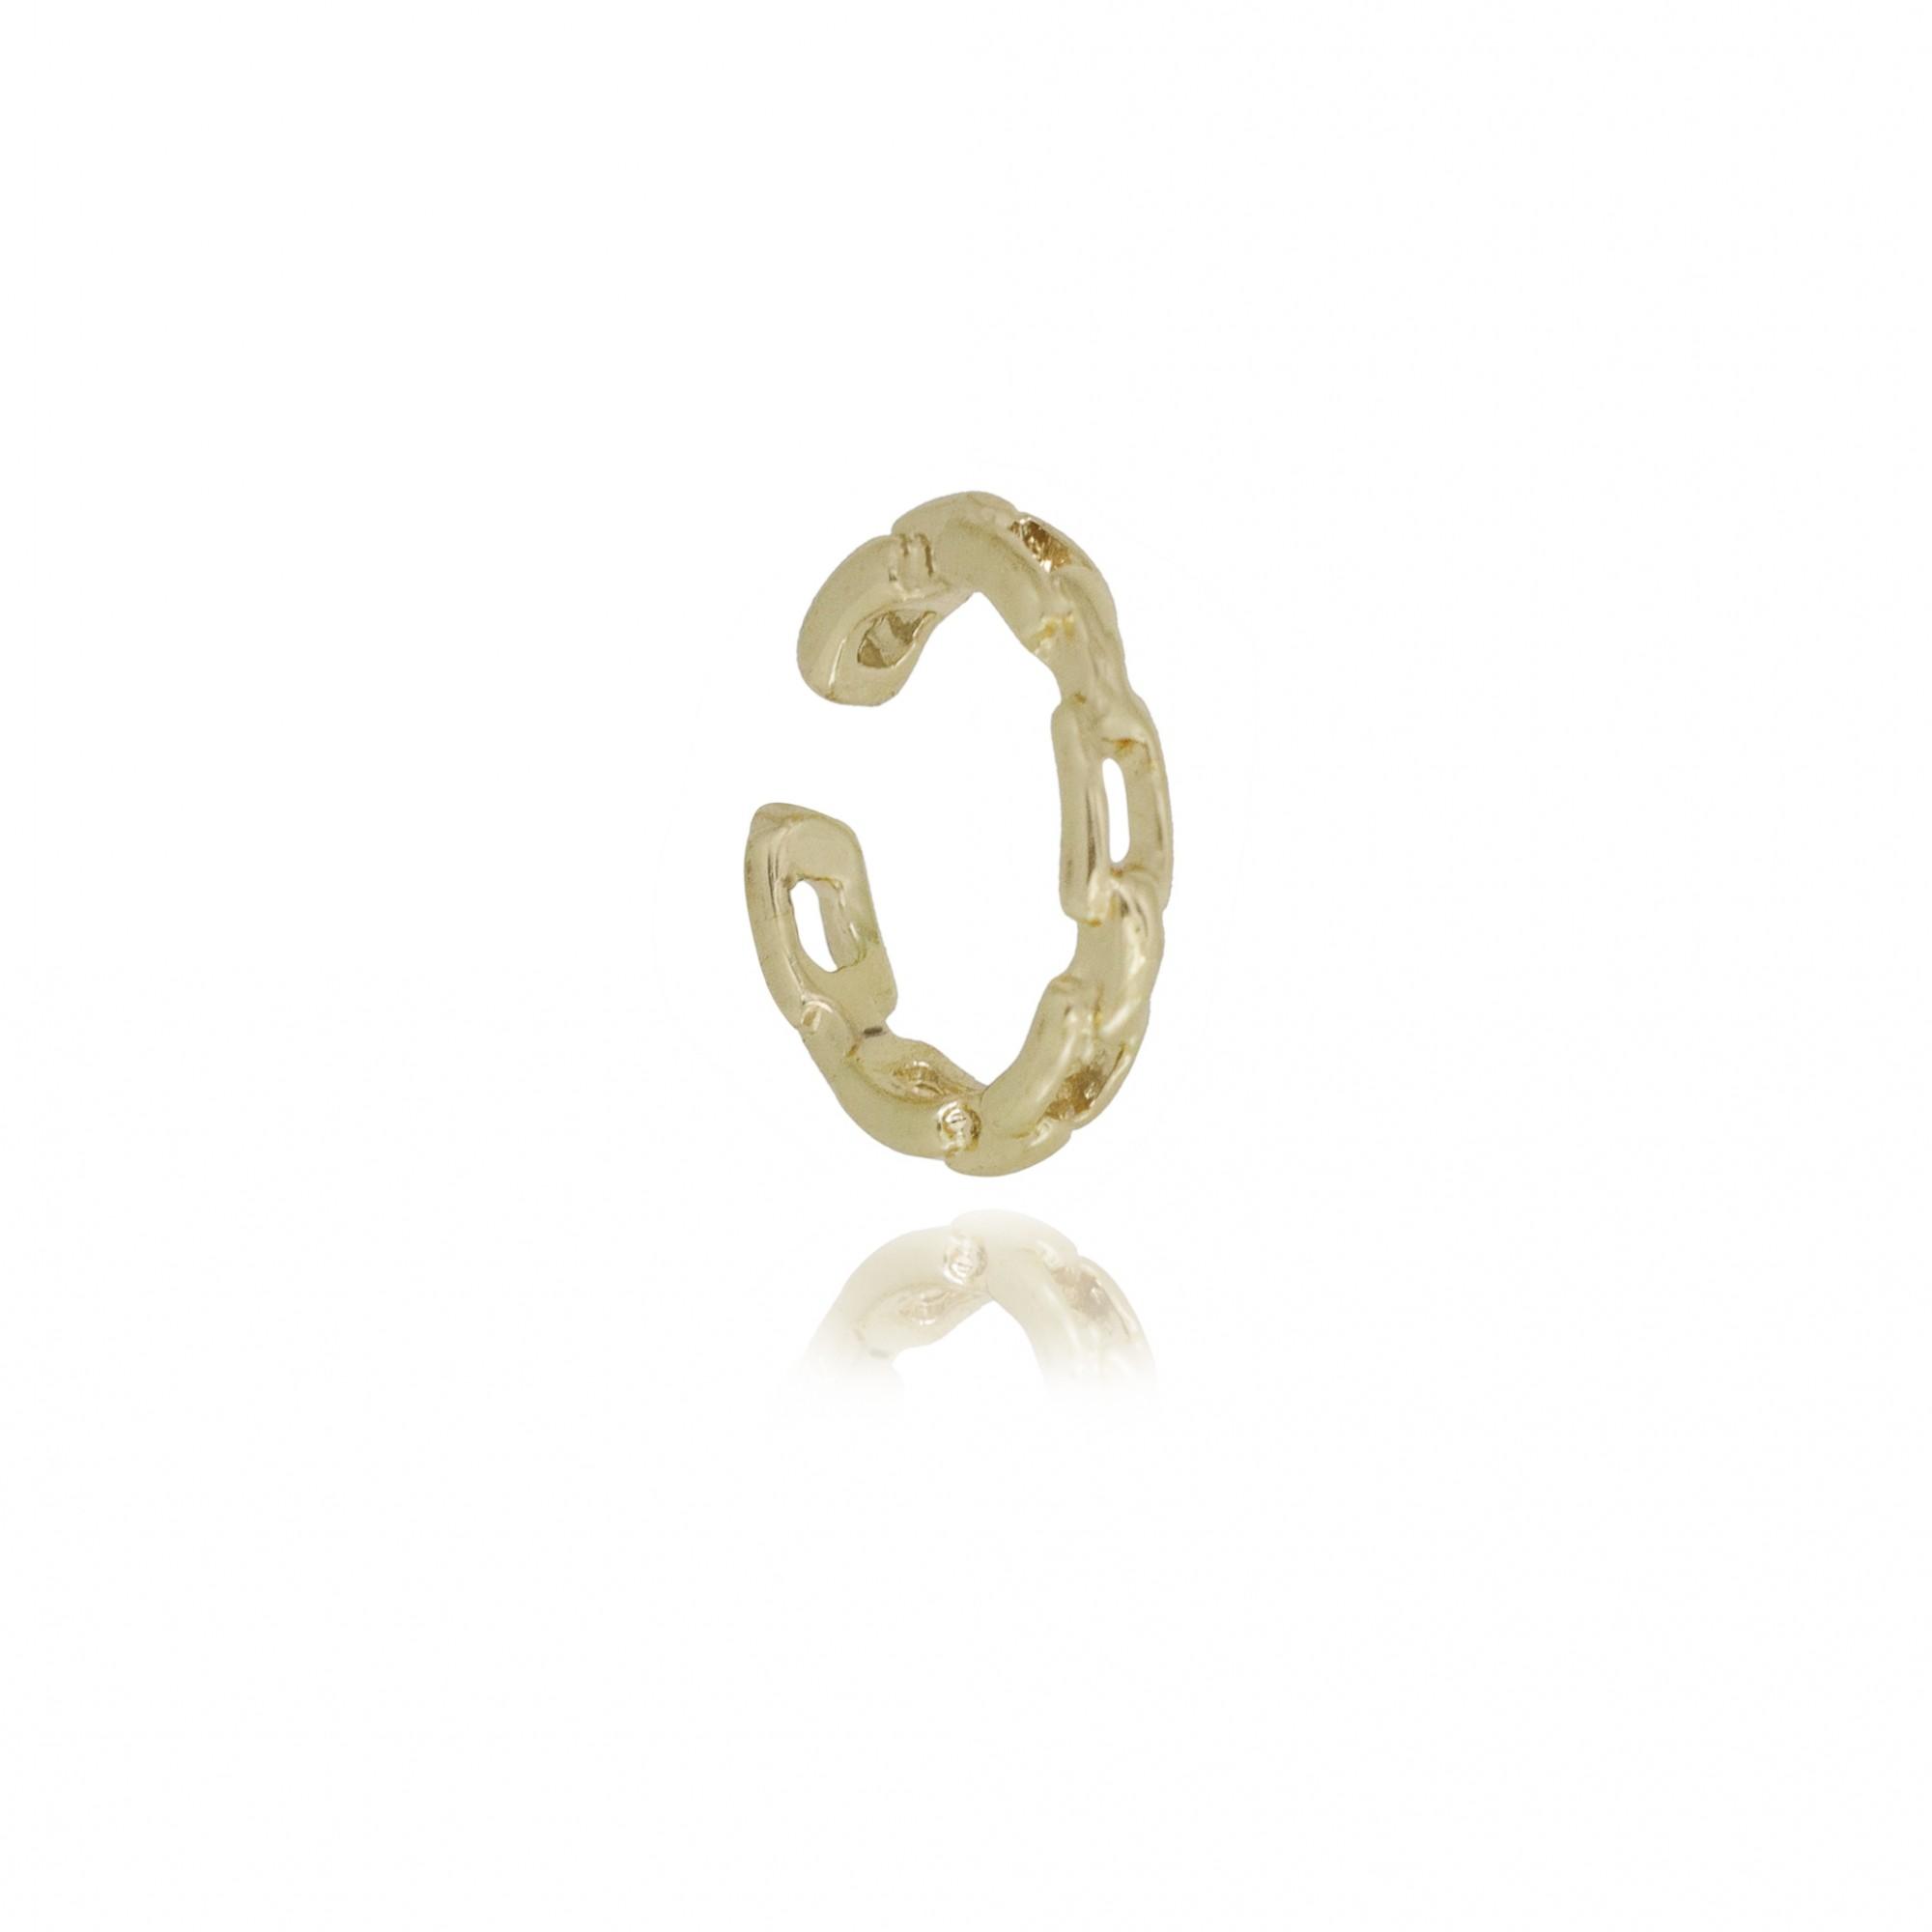 Piercing fake semijoia corrente folheado a ouro 18k ou ródio